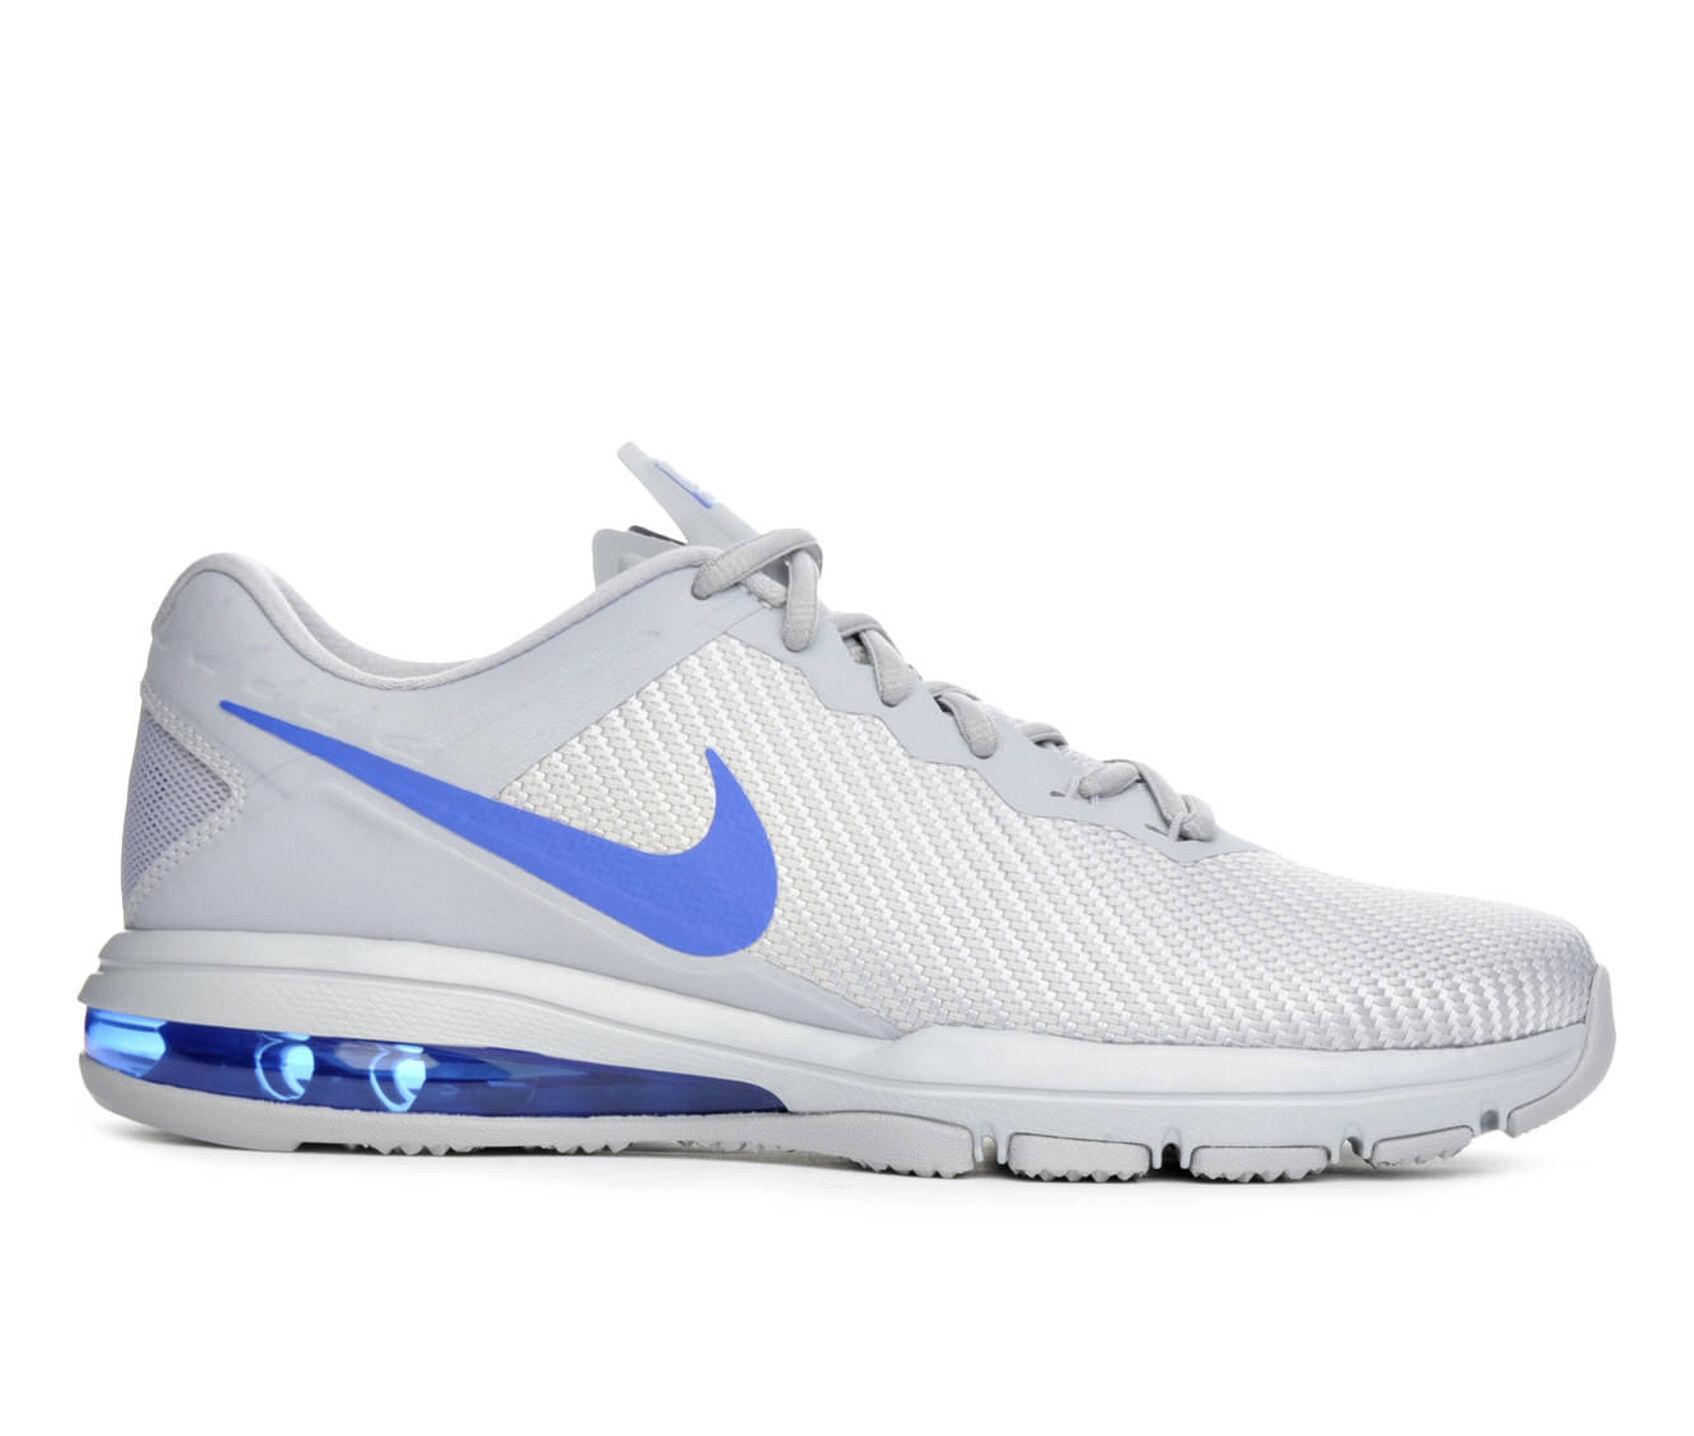 Nike Air Monarch Shoe Carnival